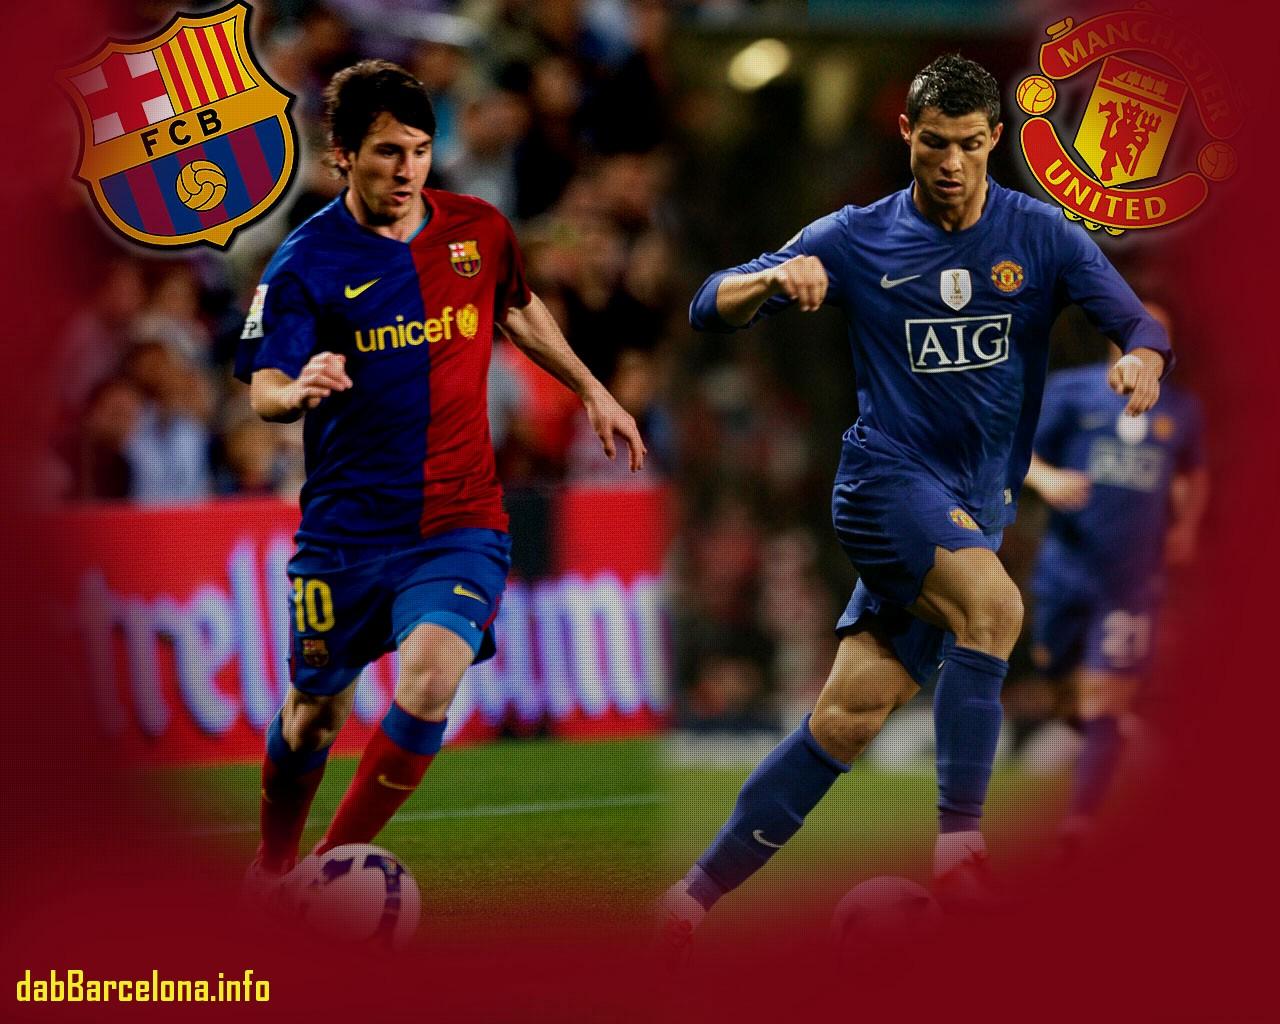 New Cristiano Ronaldo Vs Messi Vs Neymar Vs Ronaldinho - Ronaldo Vs Messi Vs Ronaldinho , HD Wallpaper & Backgrounds